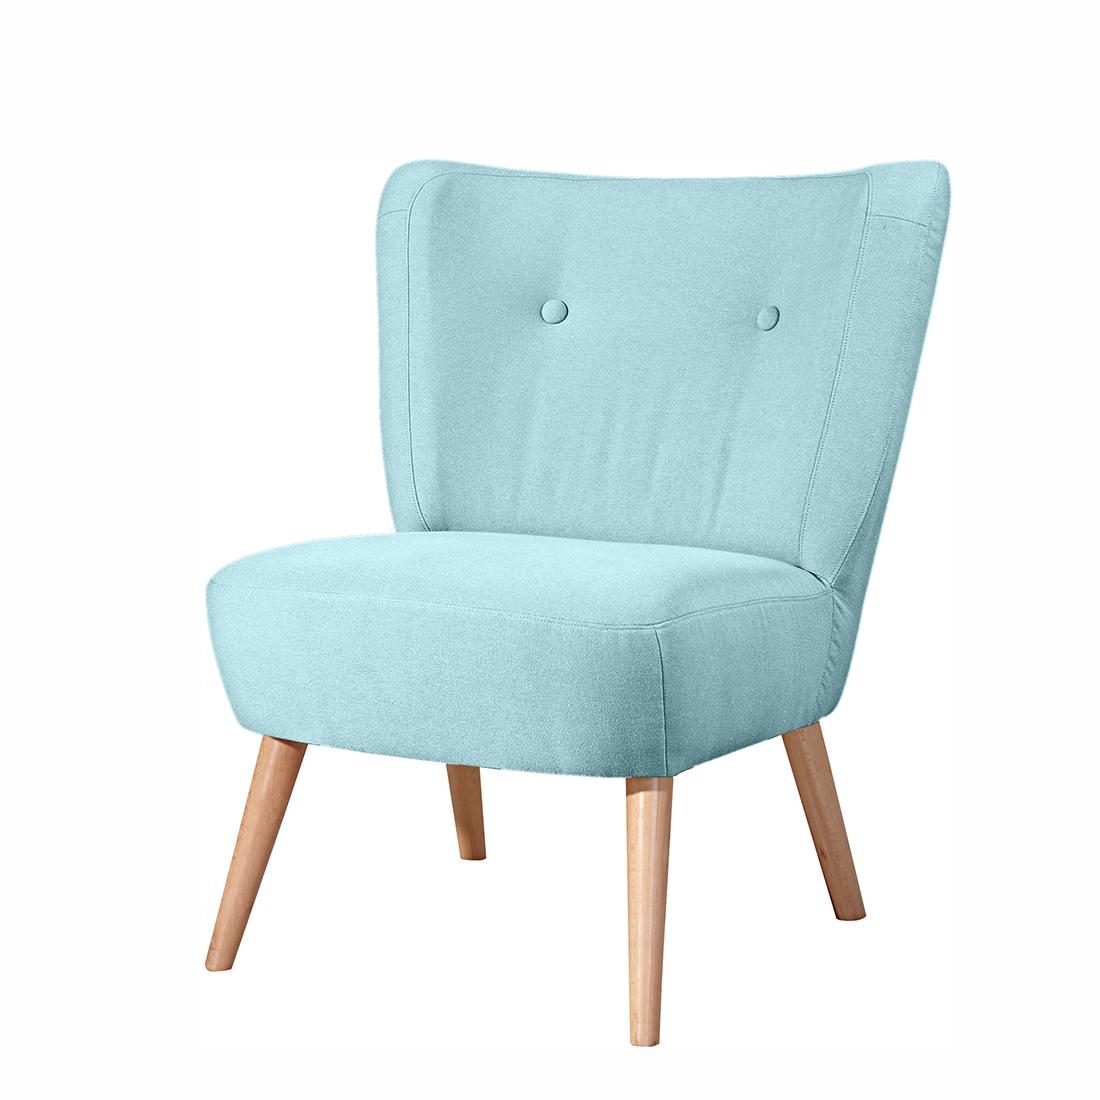 sessel hellblau fliesen 2017. Black Bedroom Furniture Sets. Home Design Ideas